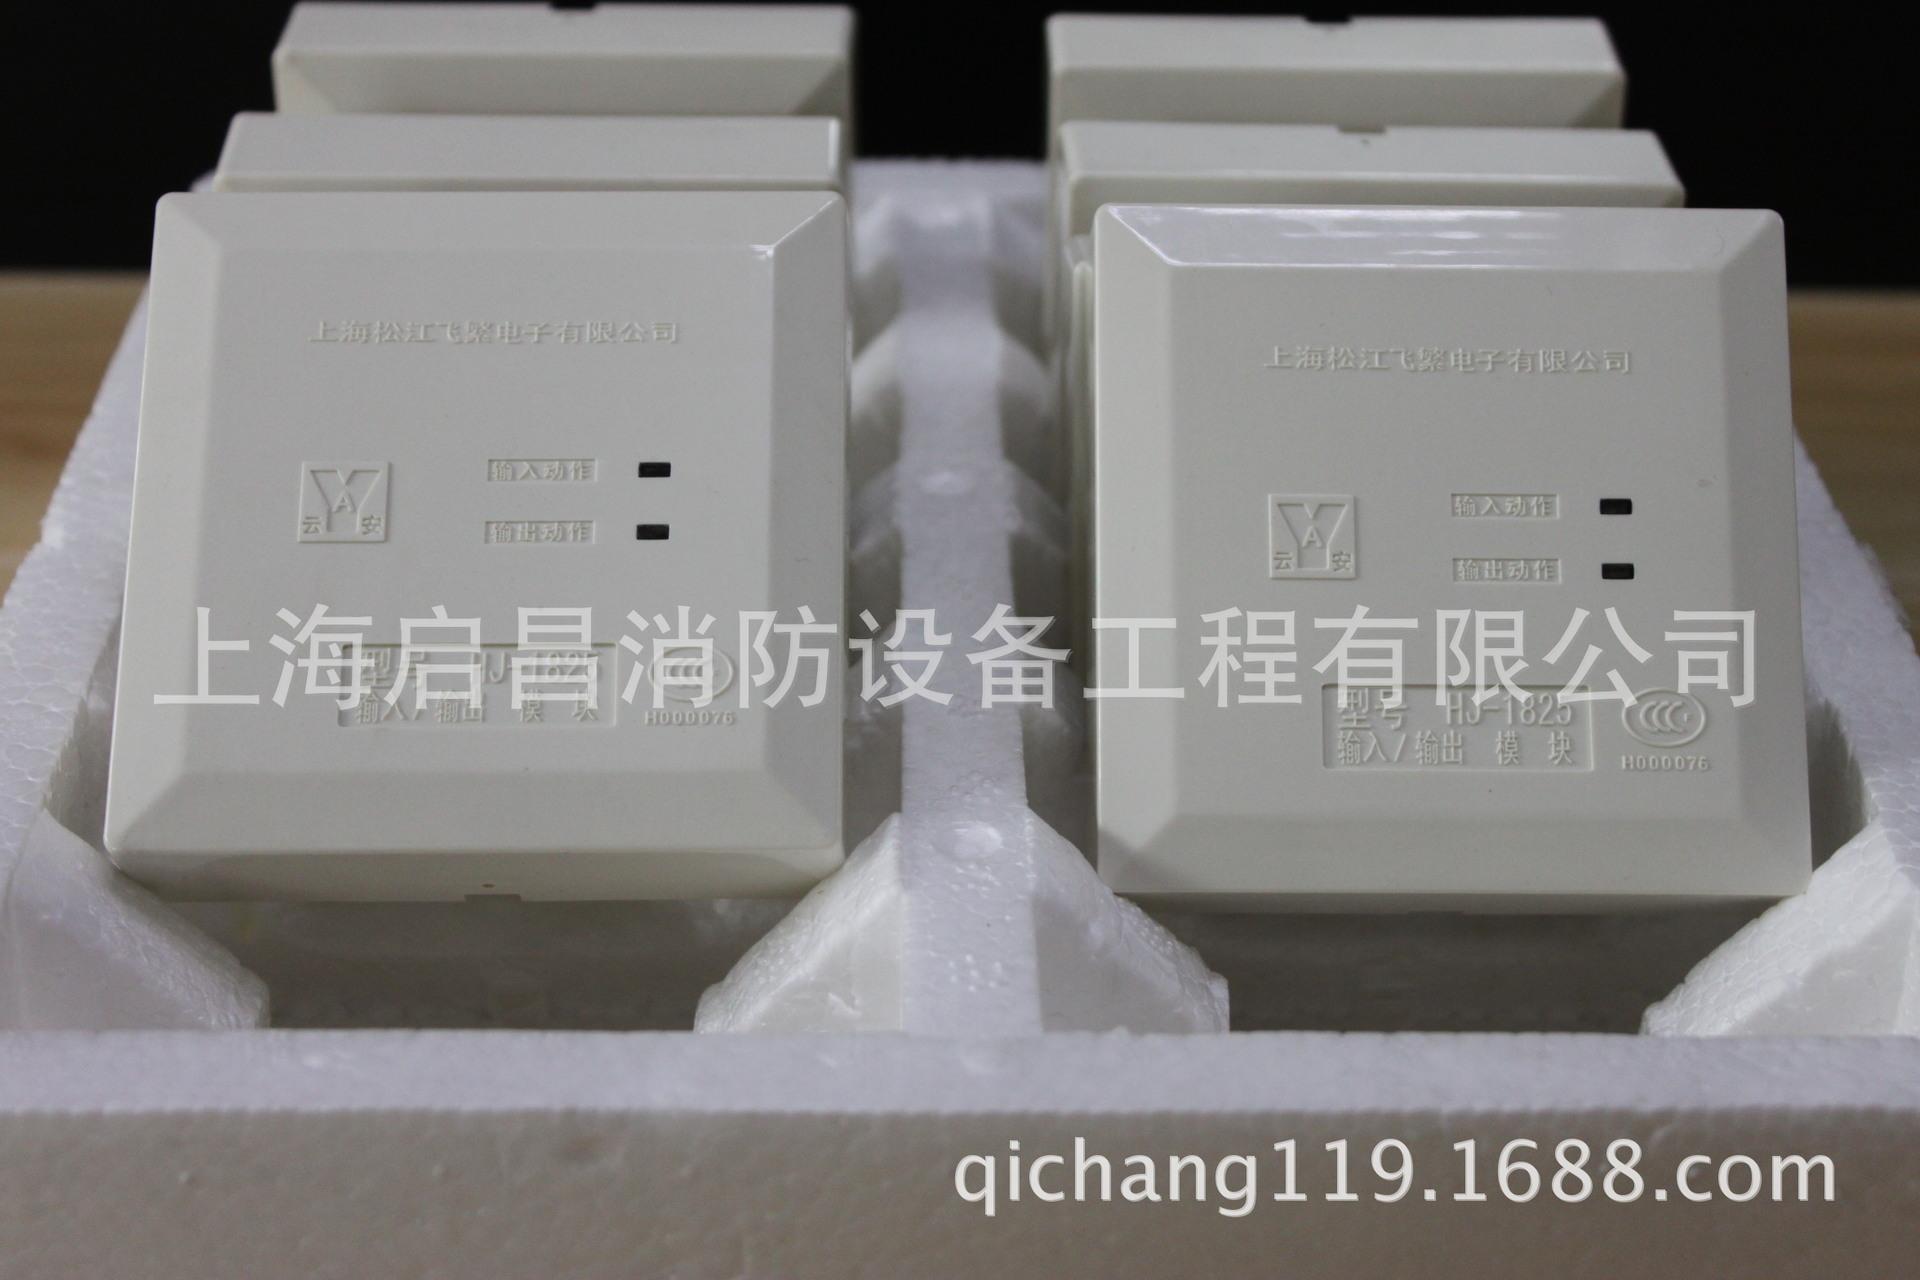 hj-1825输入输出模块 松江云安 输入输出模块